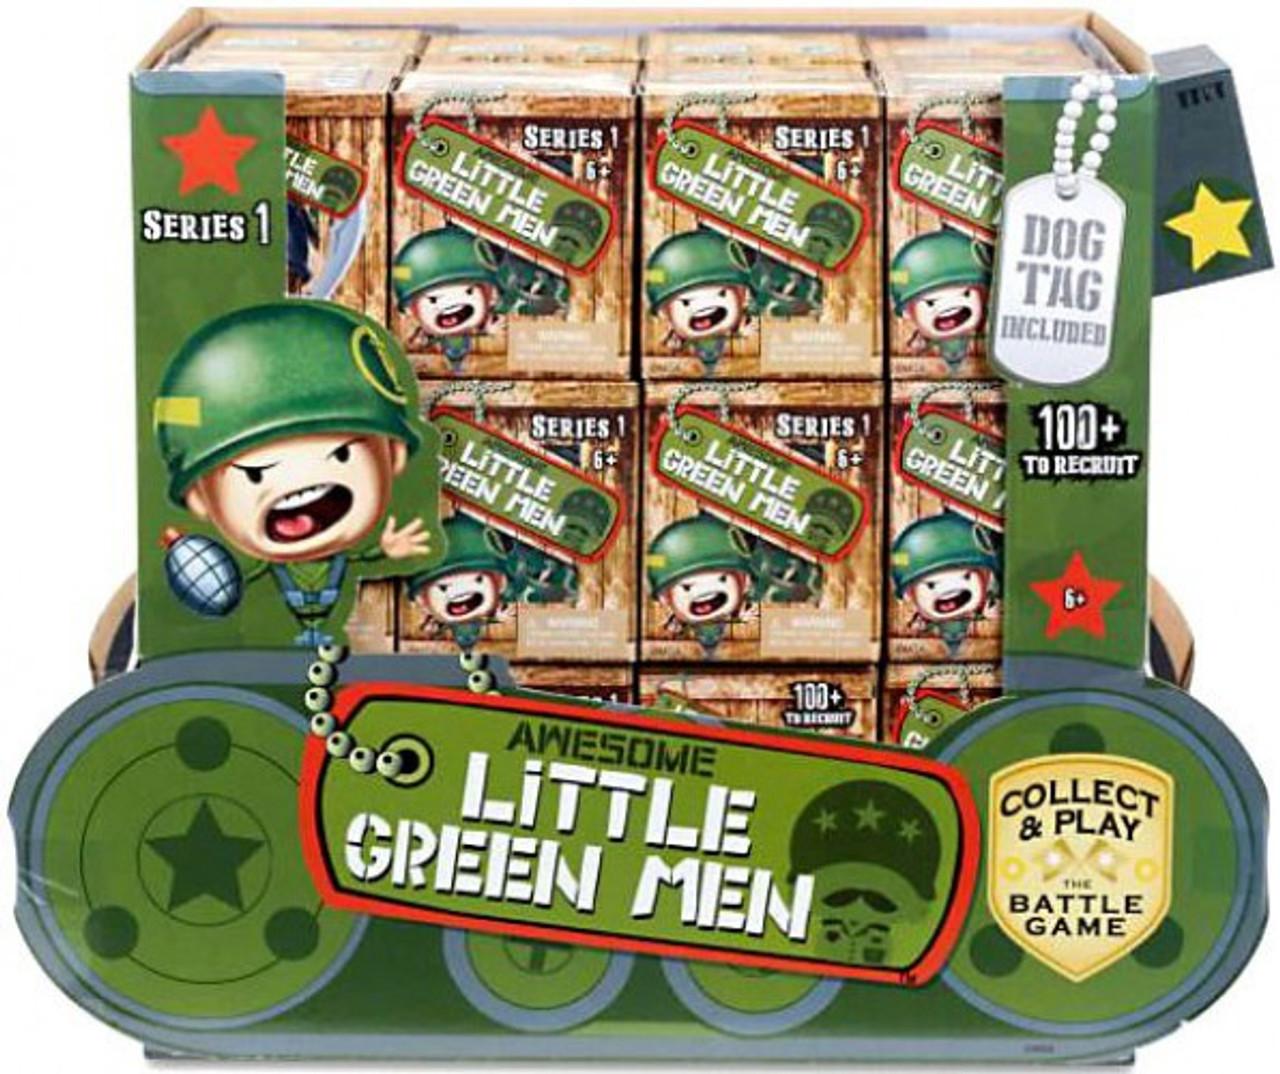 3 Awesome Little Green Men Mystery Blind Pack Series 1 Vinyl figure Brand New